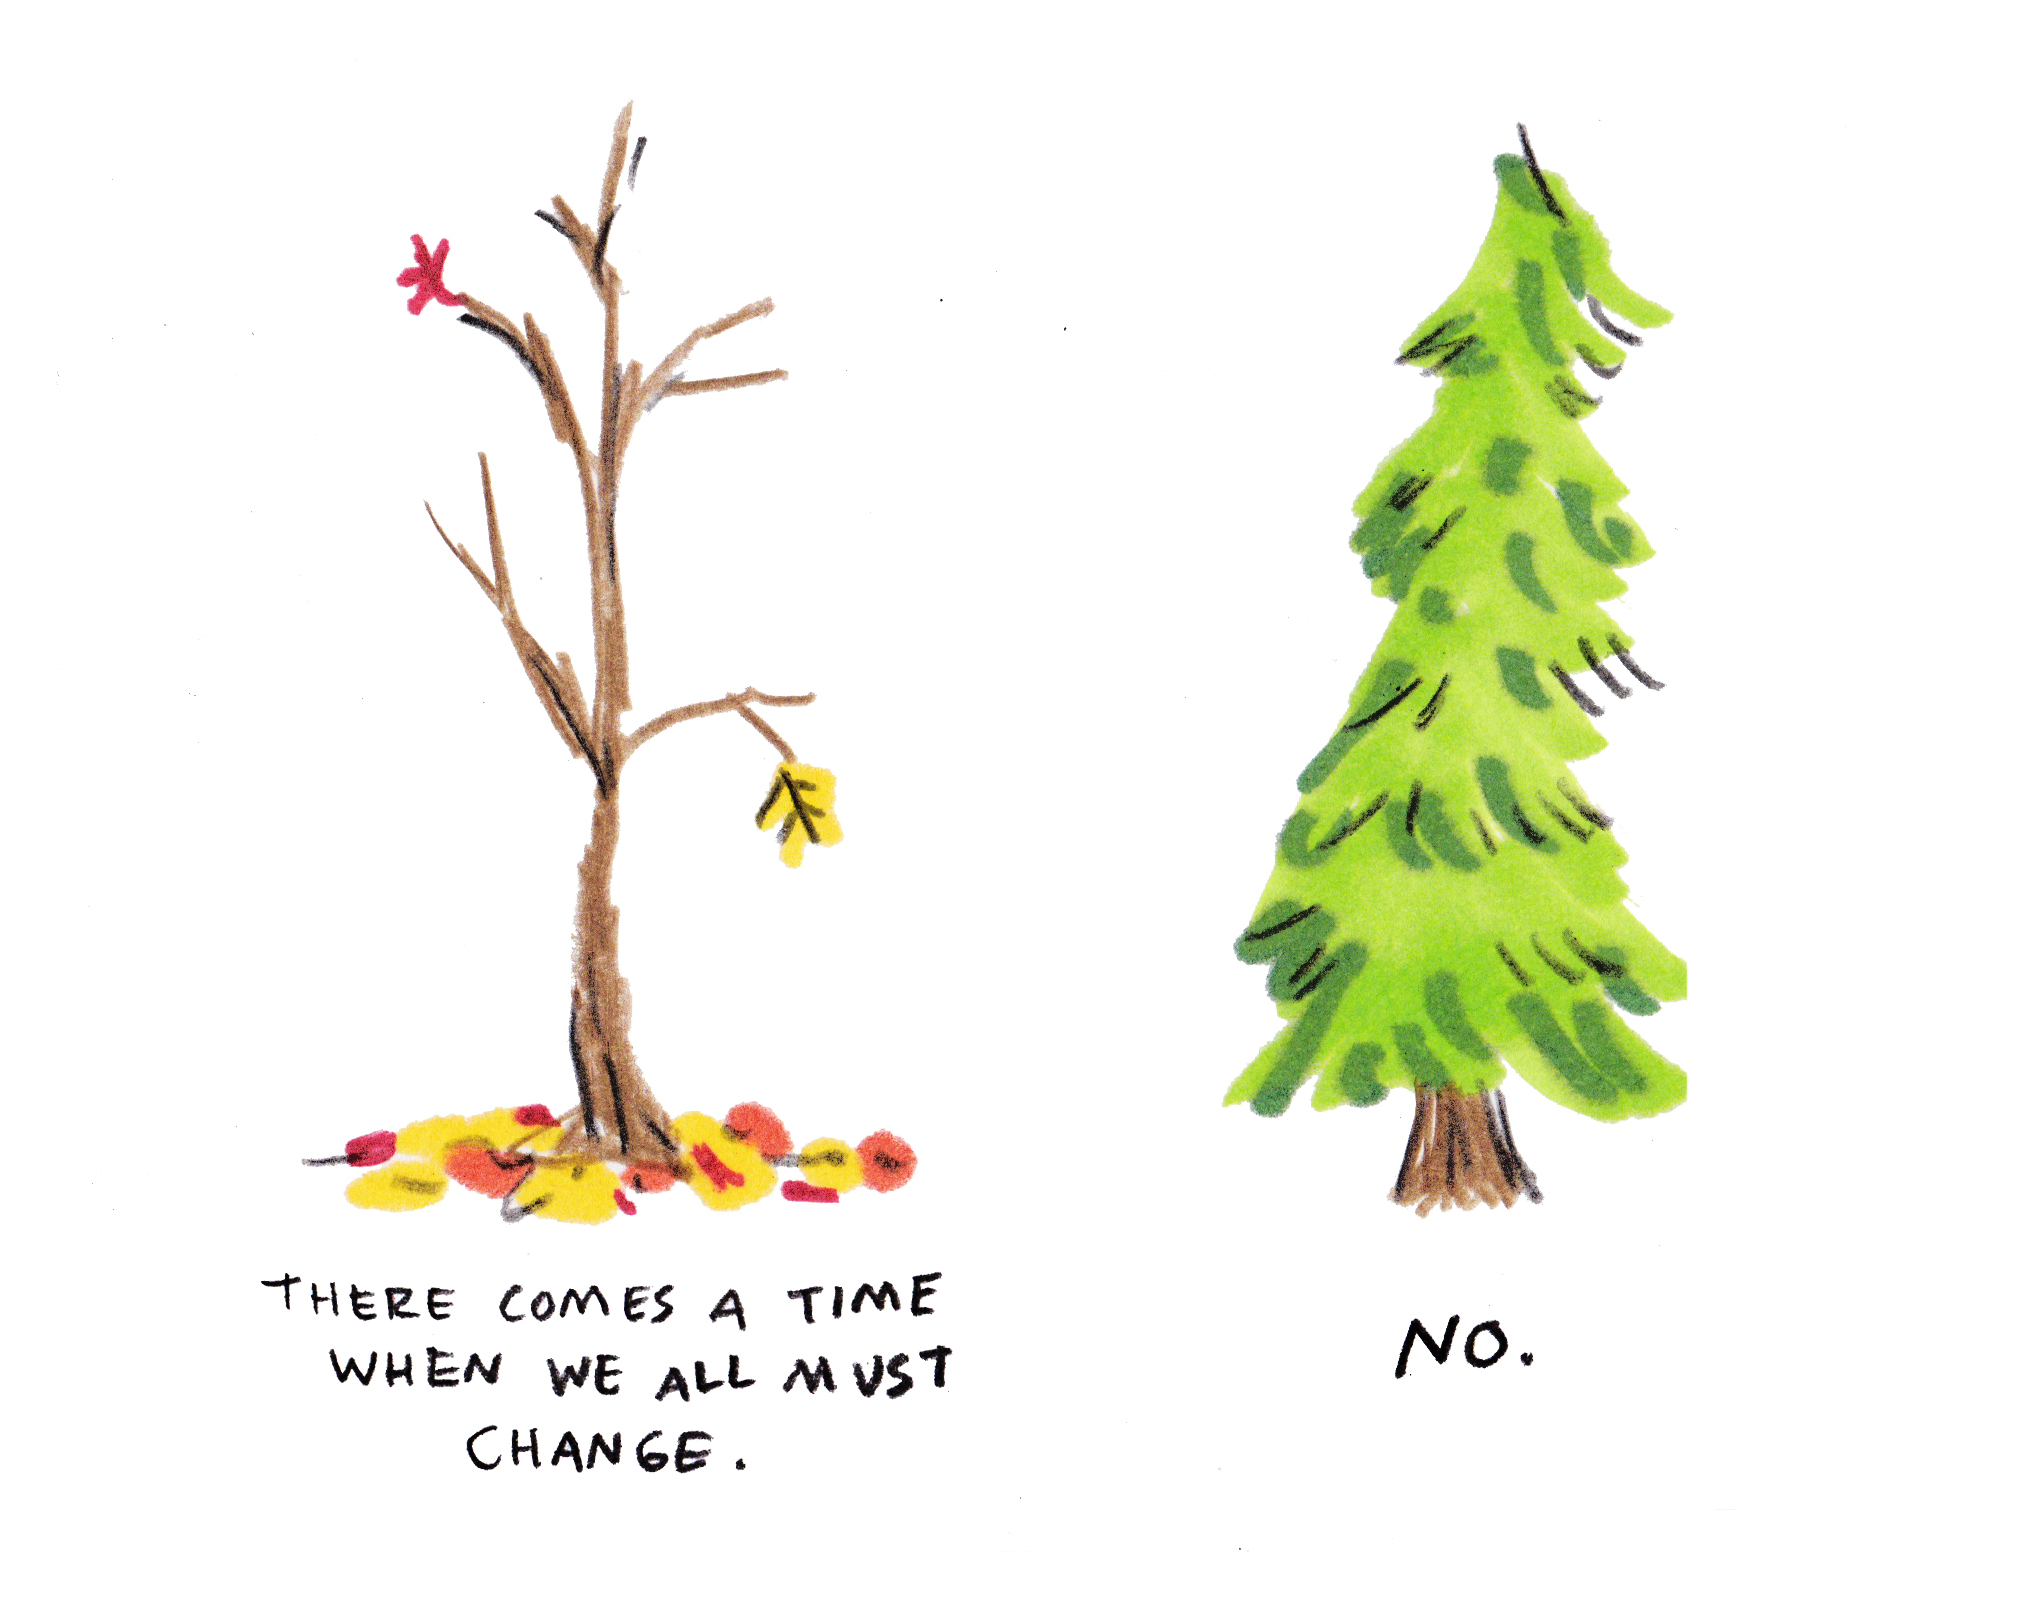 Merc_Comics_Trees.jpg